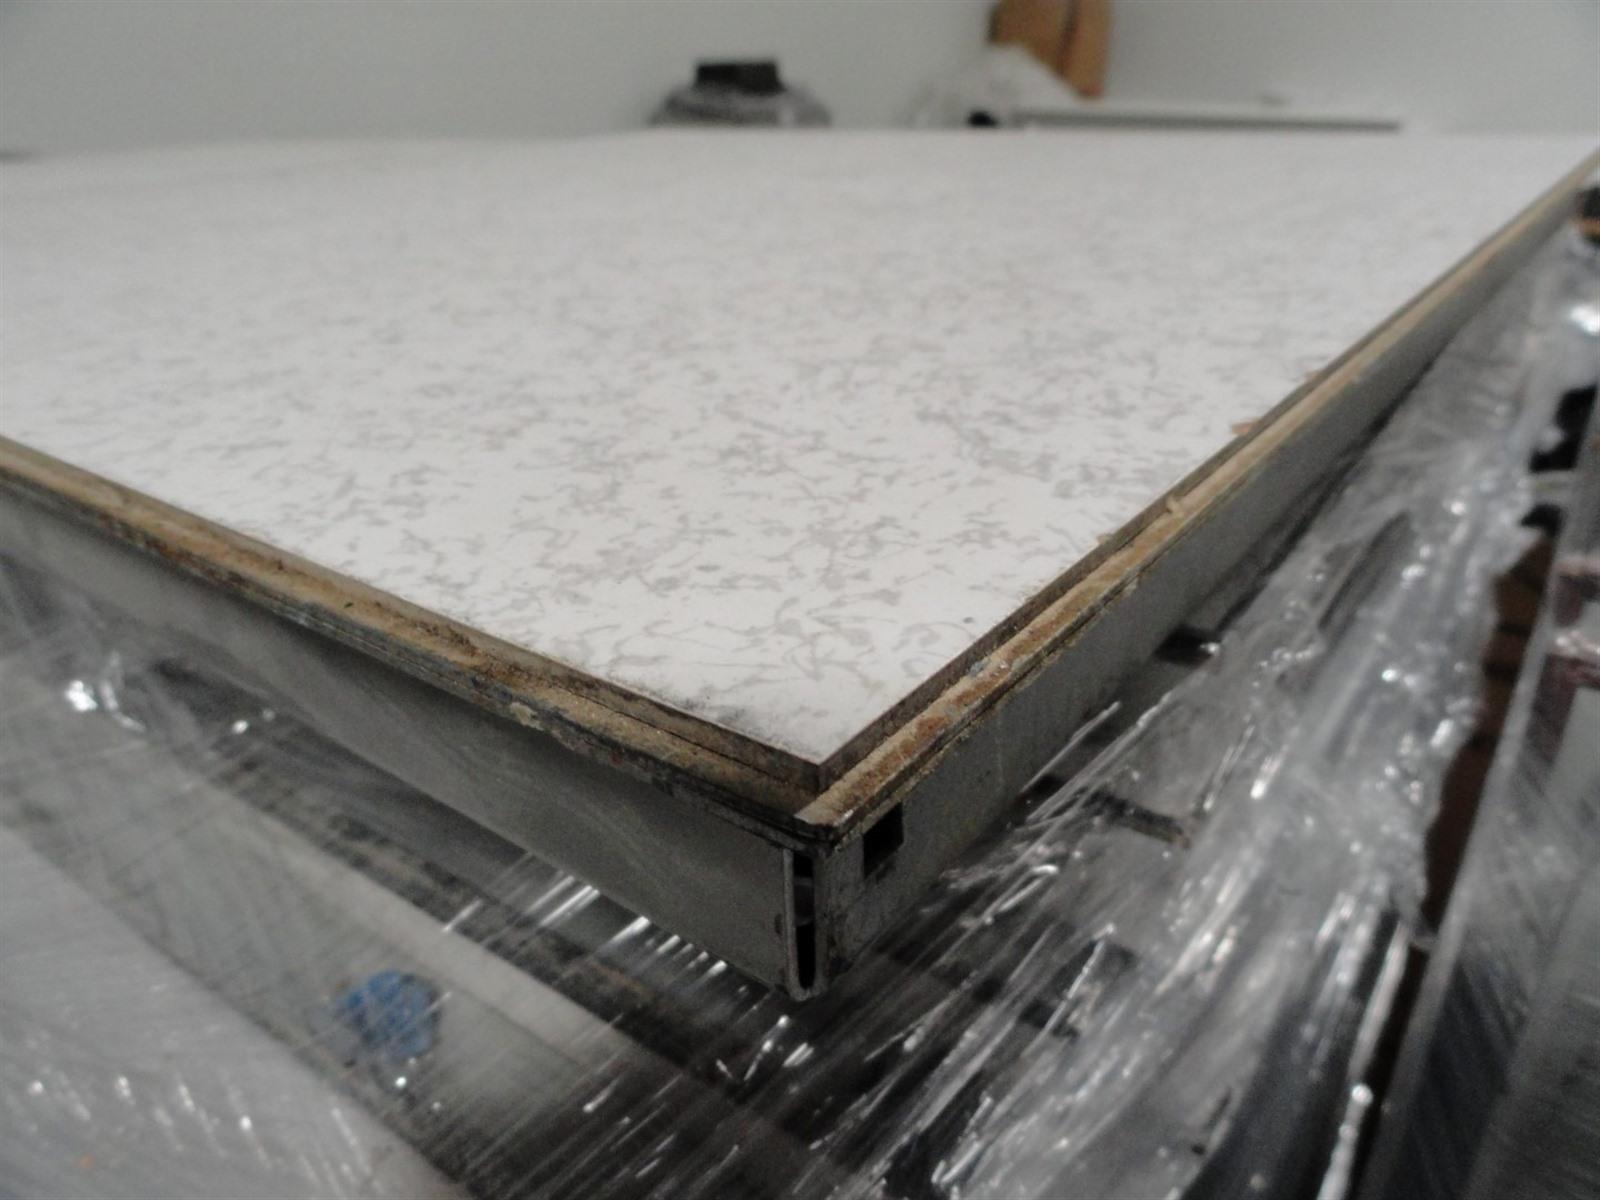 Computer Server Room Data Center Raised Access Panel Floor Tiles